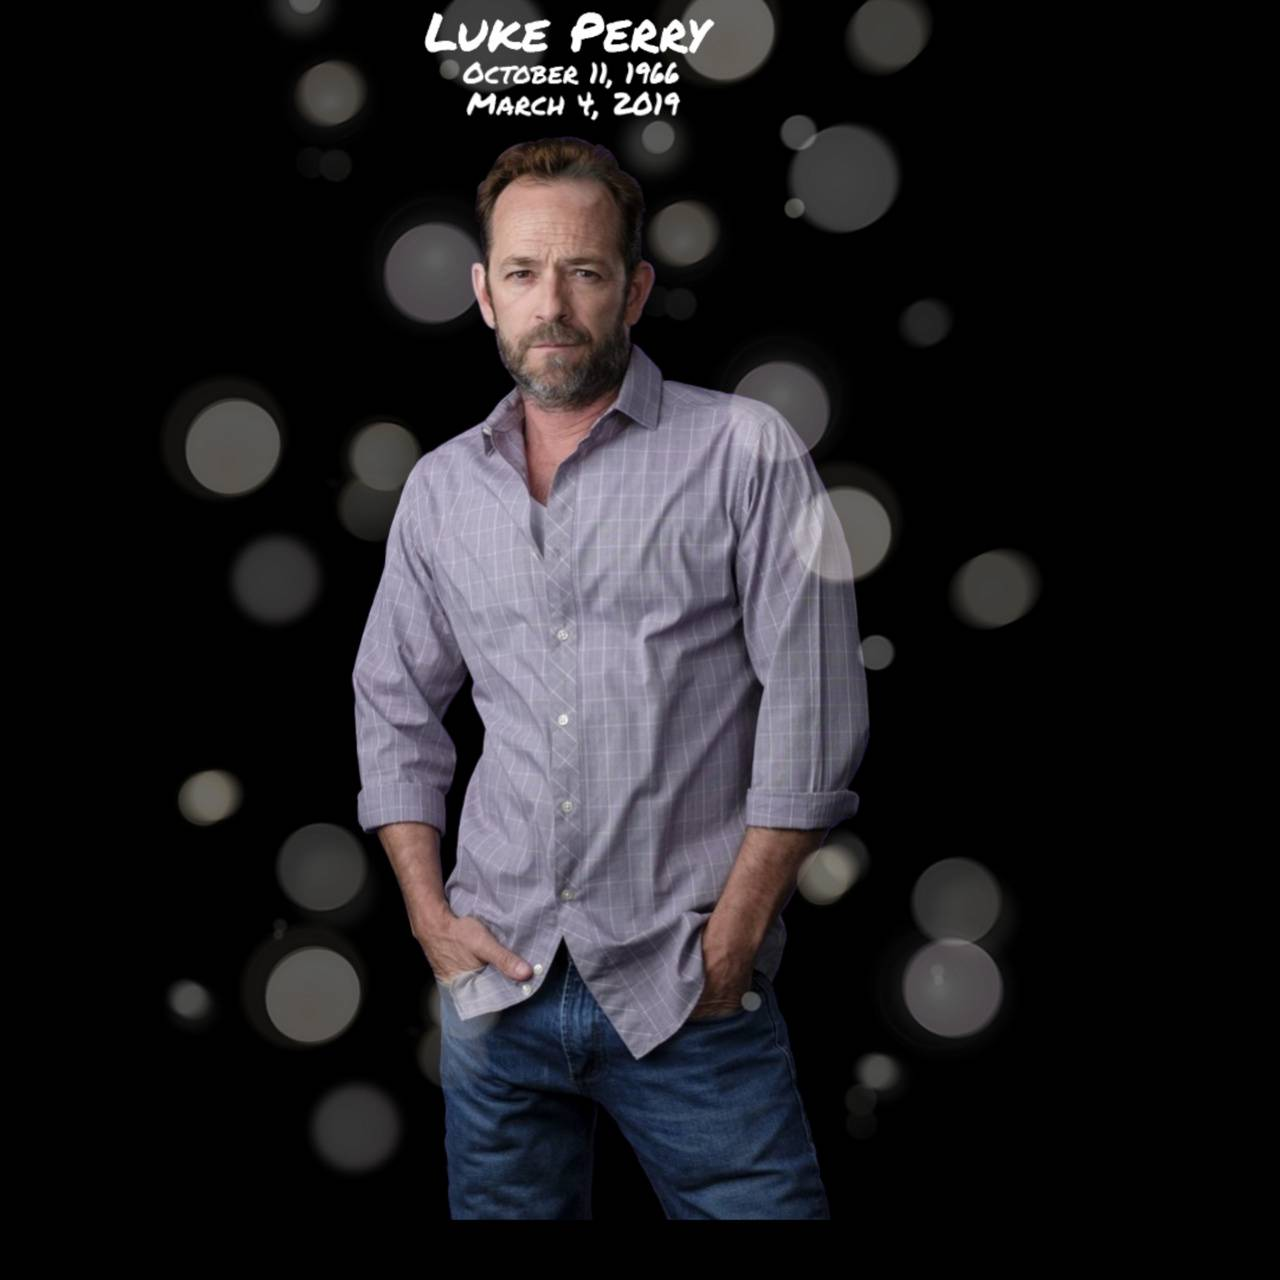 Luke Perry RIP